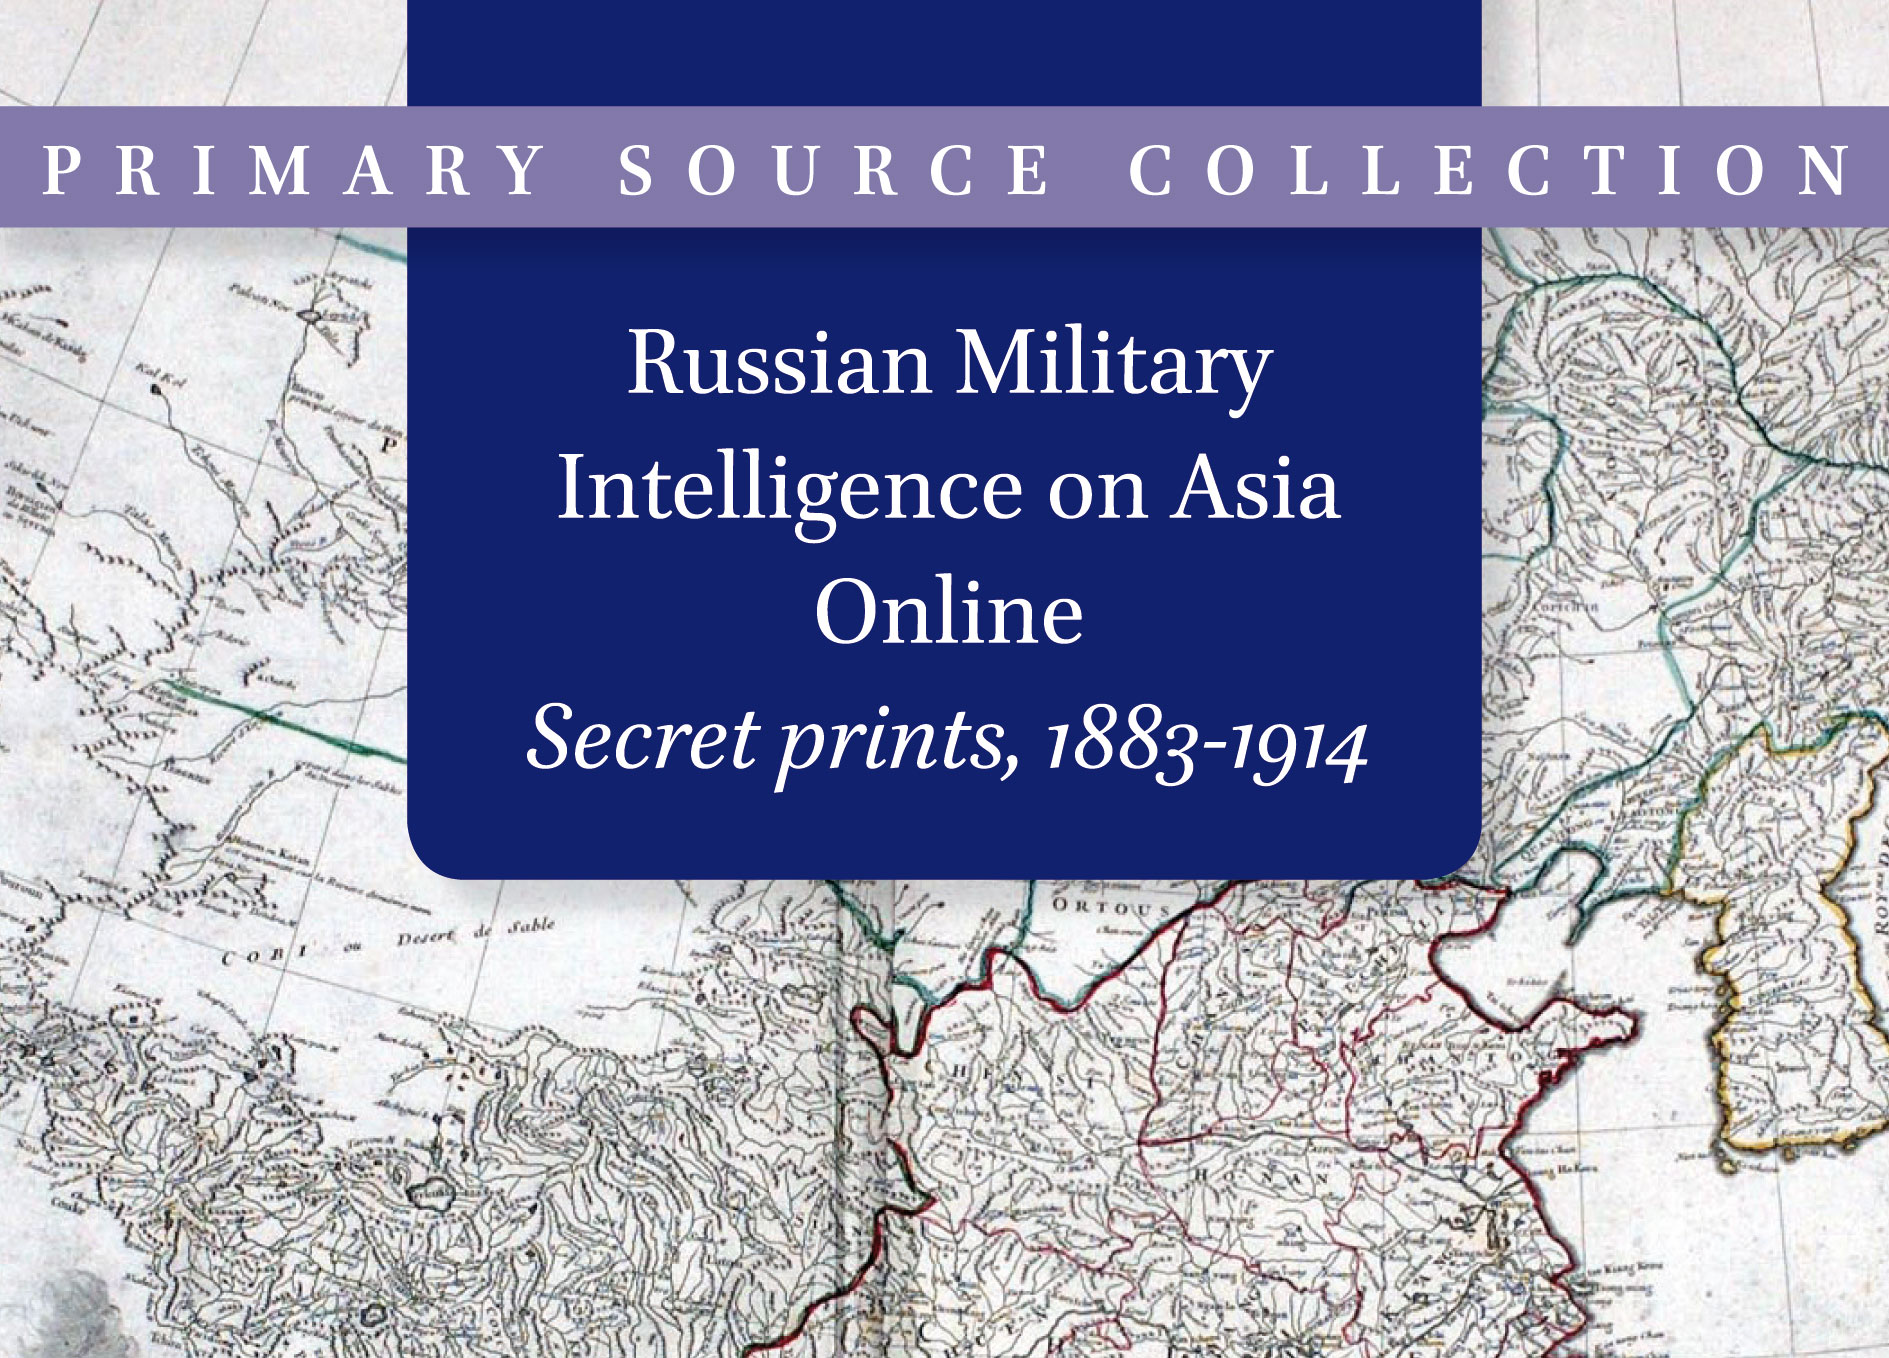 Russian Military Intelligence on Asia Online, Secret prints, 1883-1914